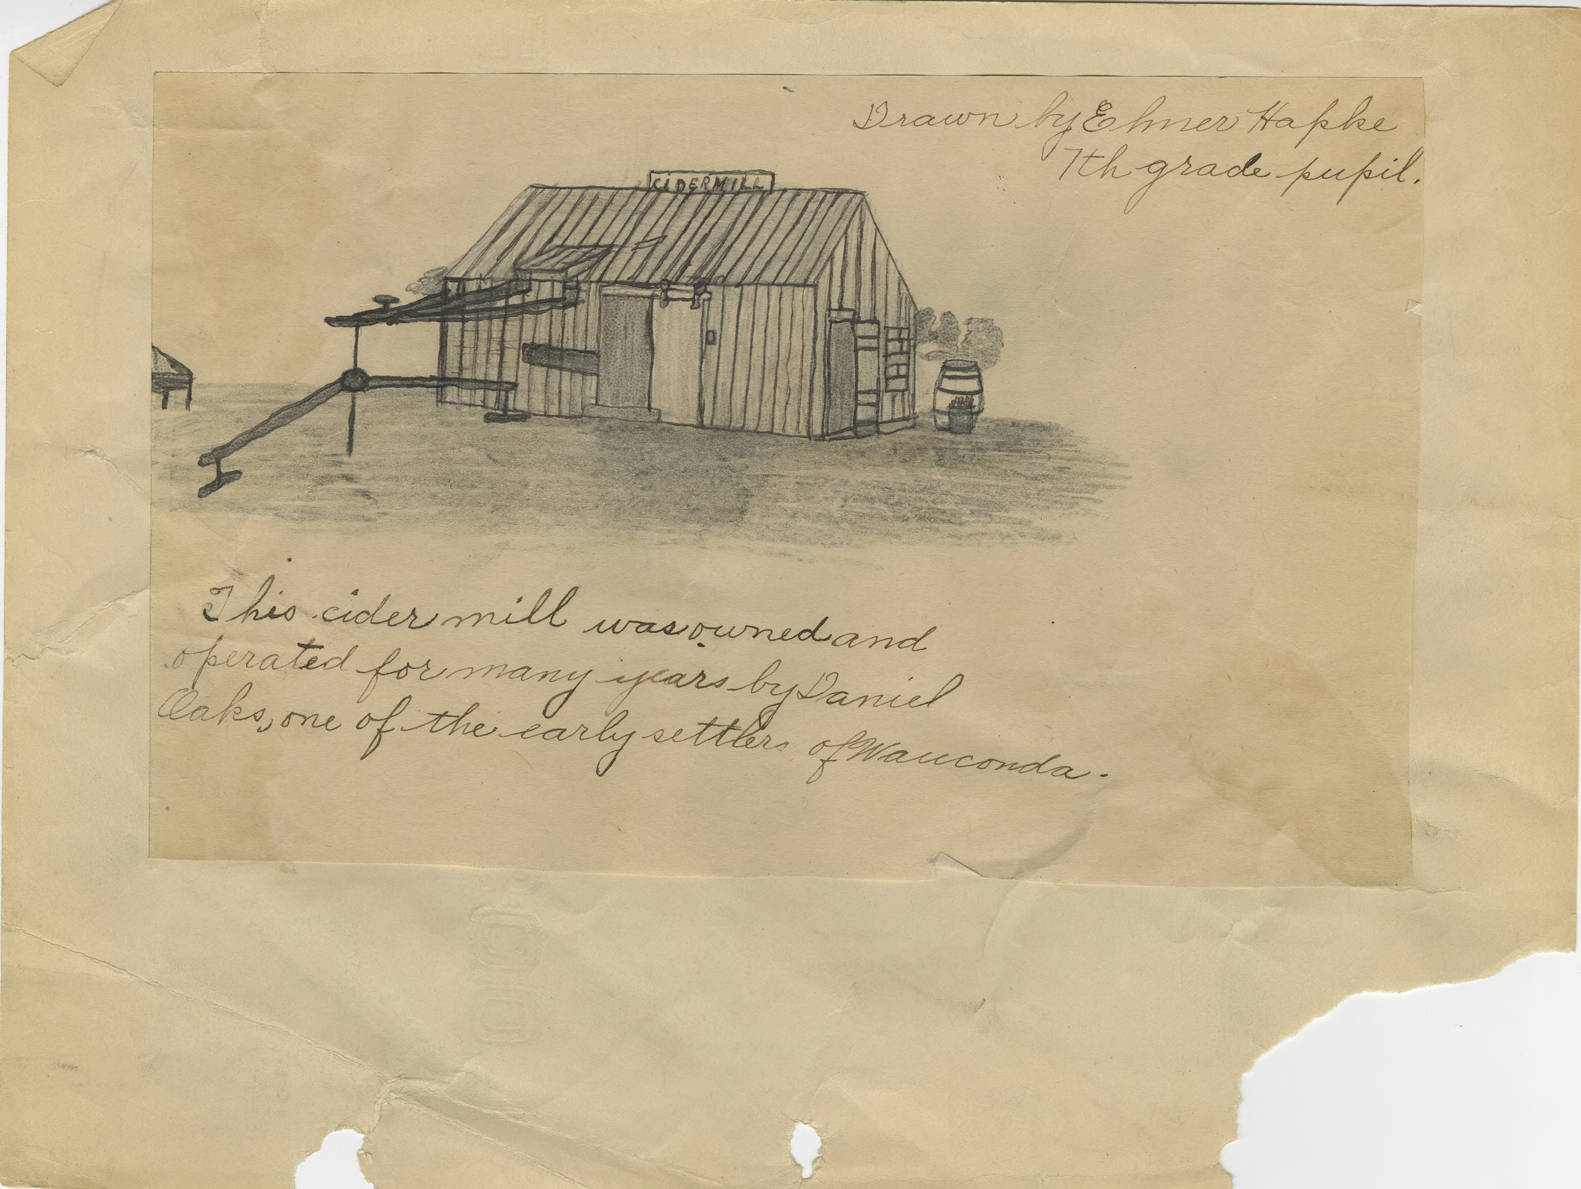 C:\Users\Vern\Documents\Fort Hill\1918 Schools Centennial\1918 Wauconda Twp Wauconda School\1918_School_Histories__Wauconda_Township__Wauconda_School_2003046_Page_49.jpg